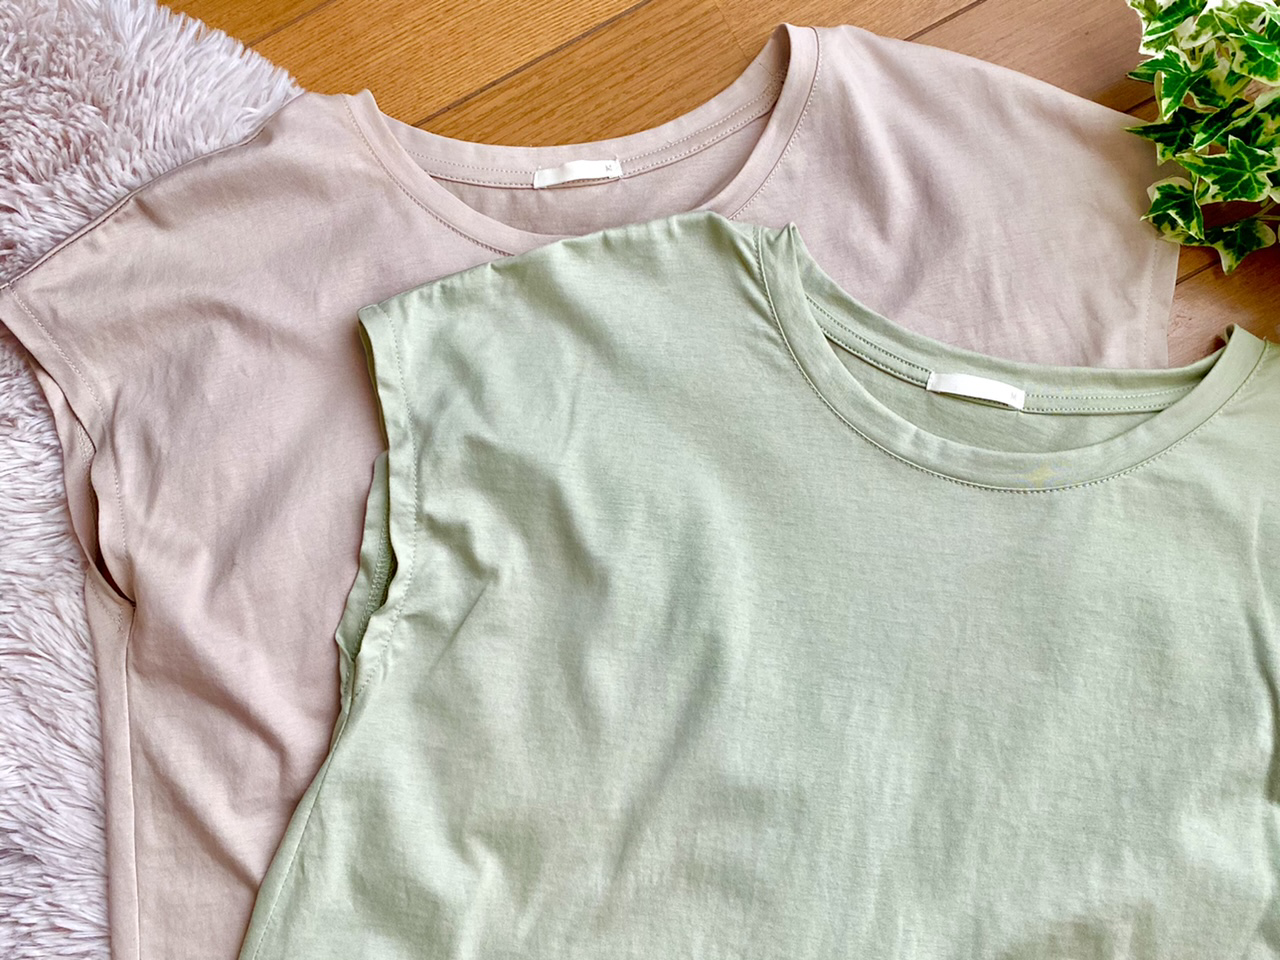 【GU】イロチ買い必至♡《サマーセール》が安すぎる!あの大人気Tシャツが590円★_2